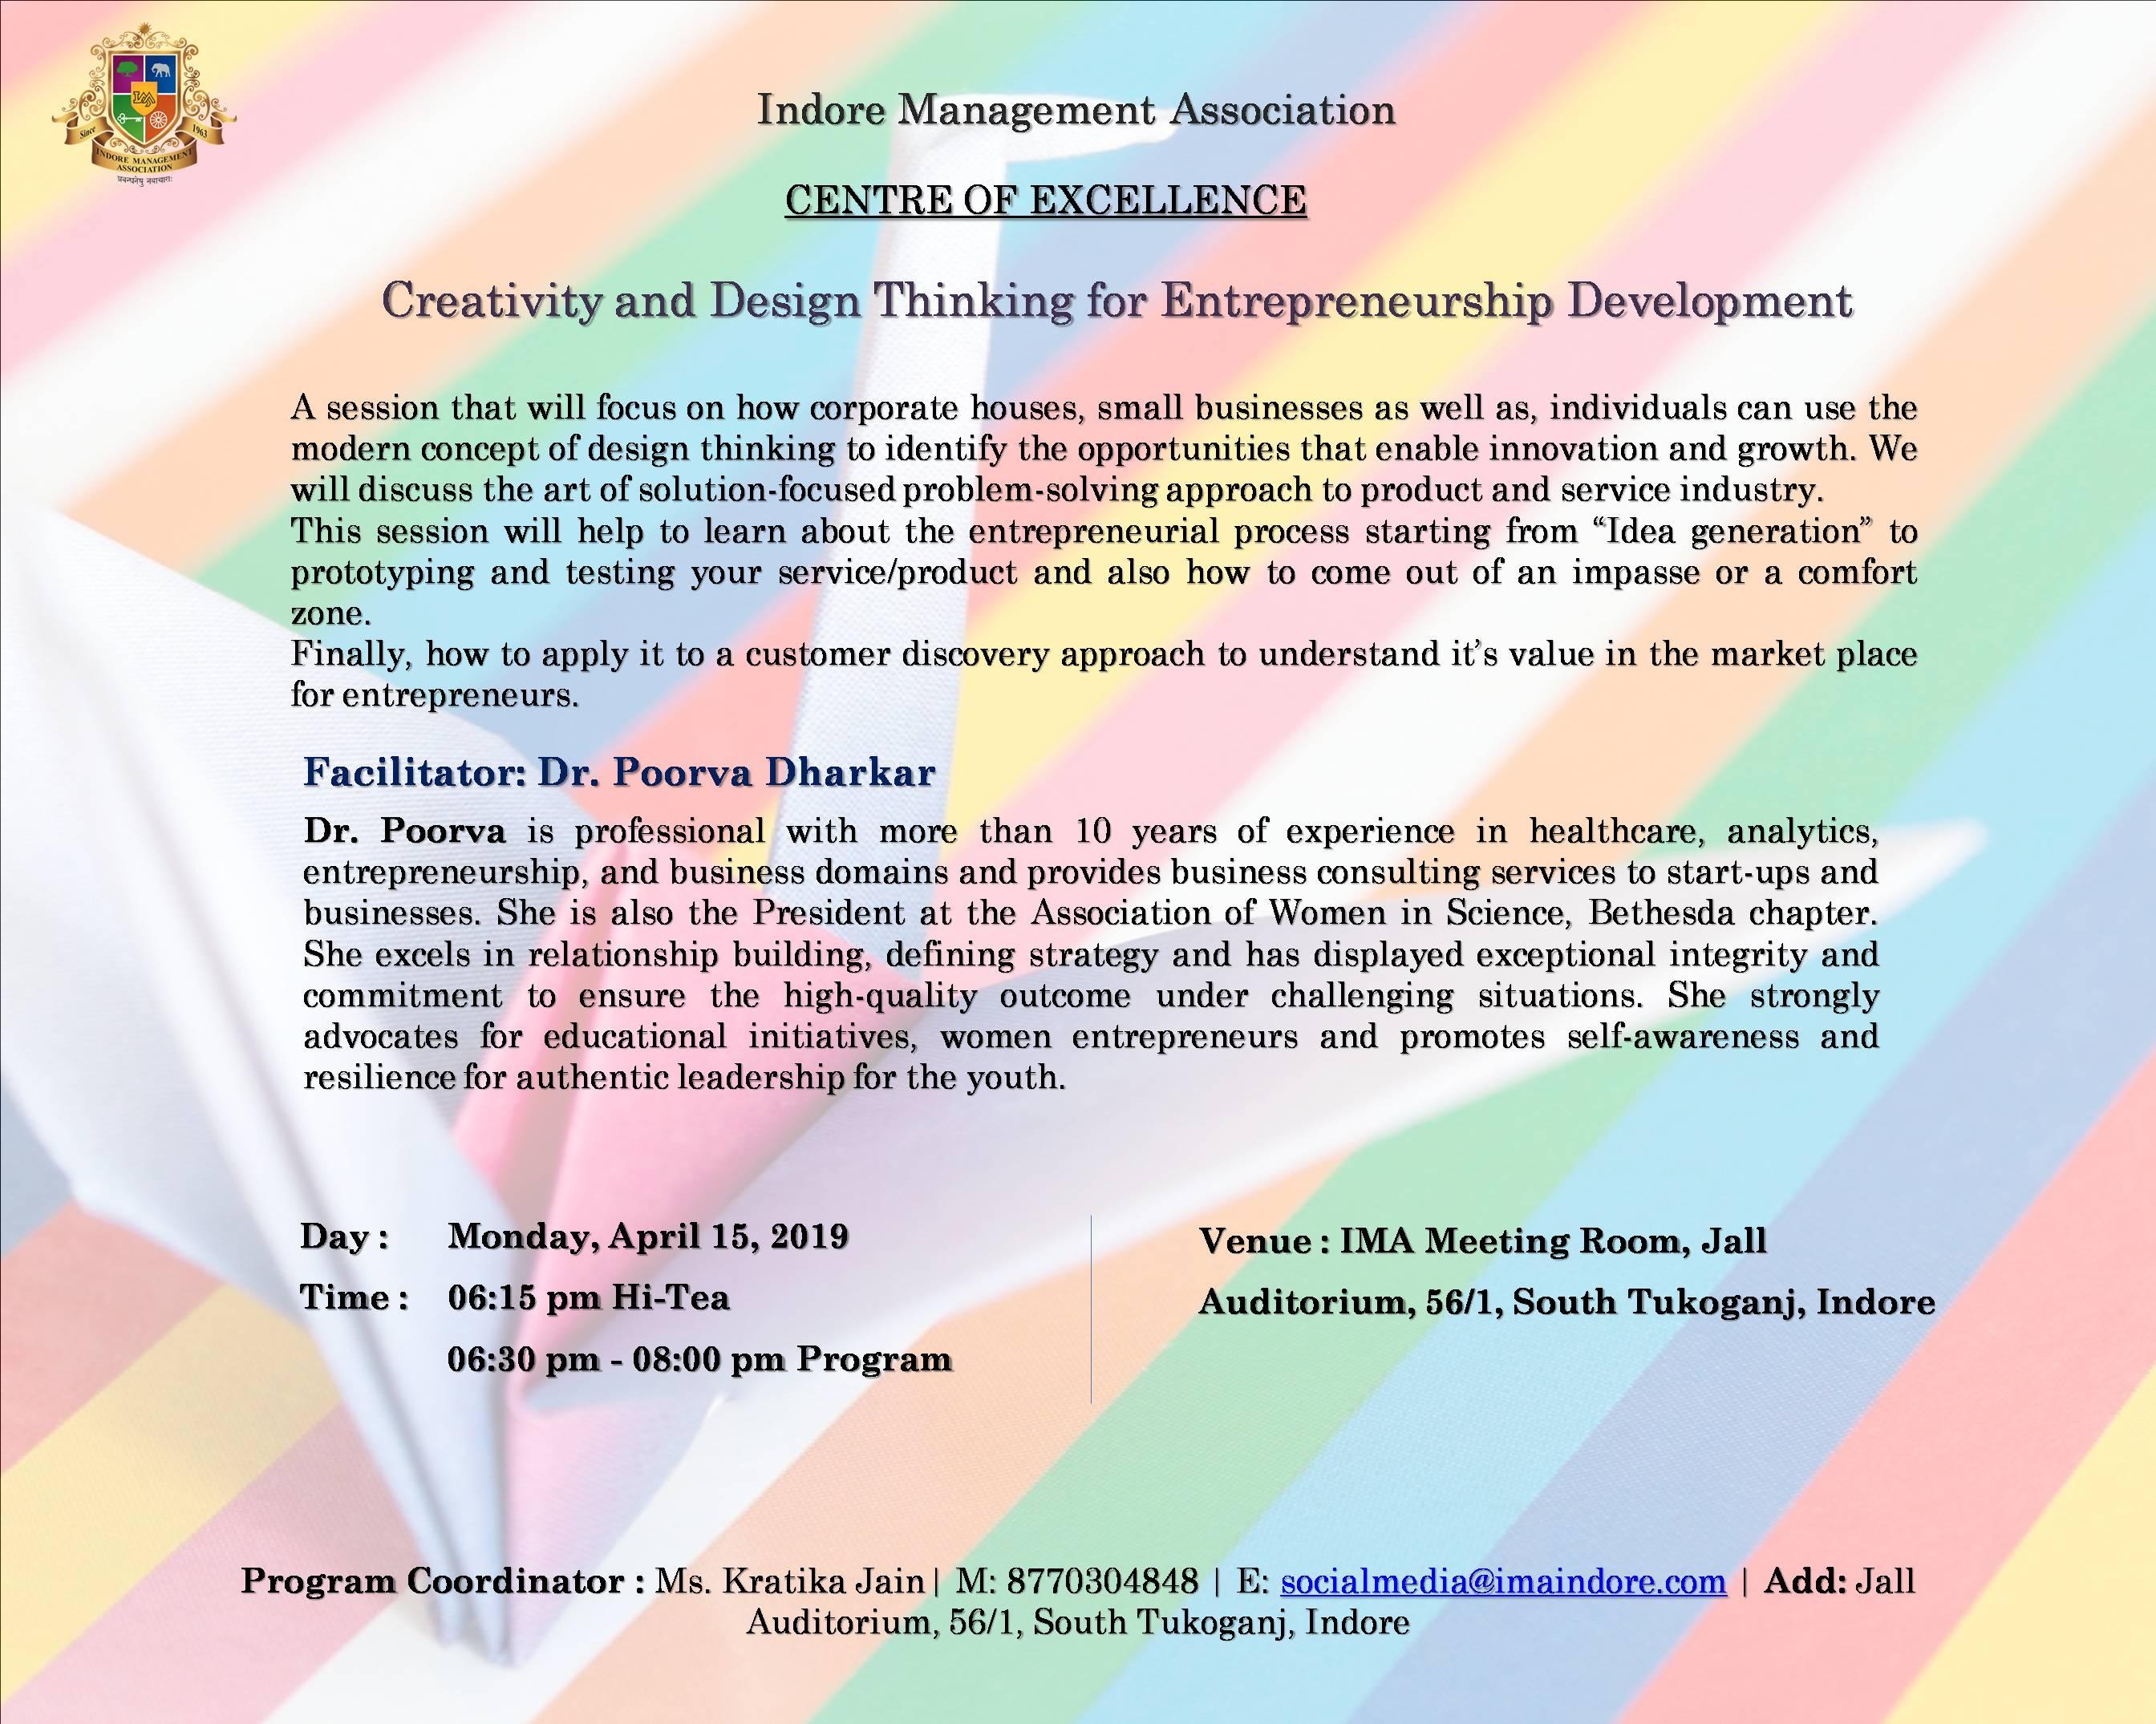 Indore Management Association